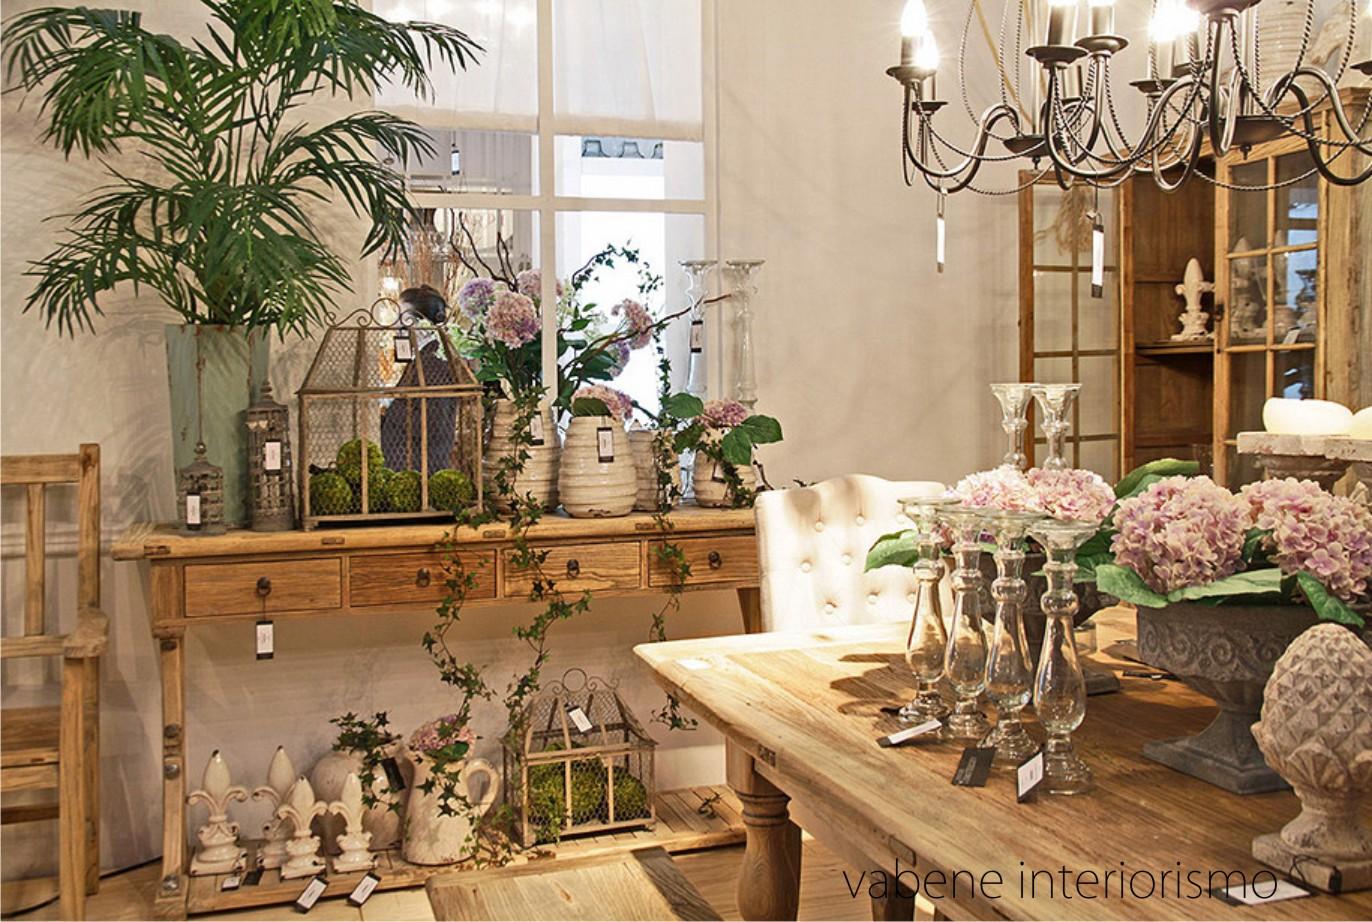 Vabene interiorismo novedades en muebles artelore for Linea actual muebles europolis